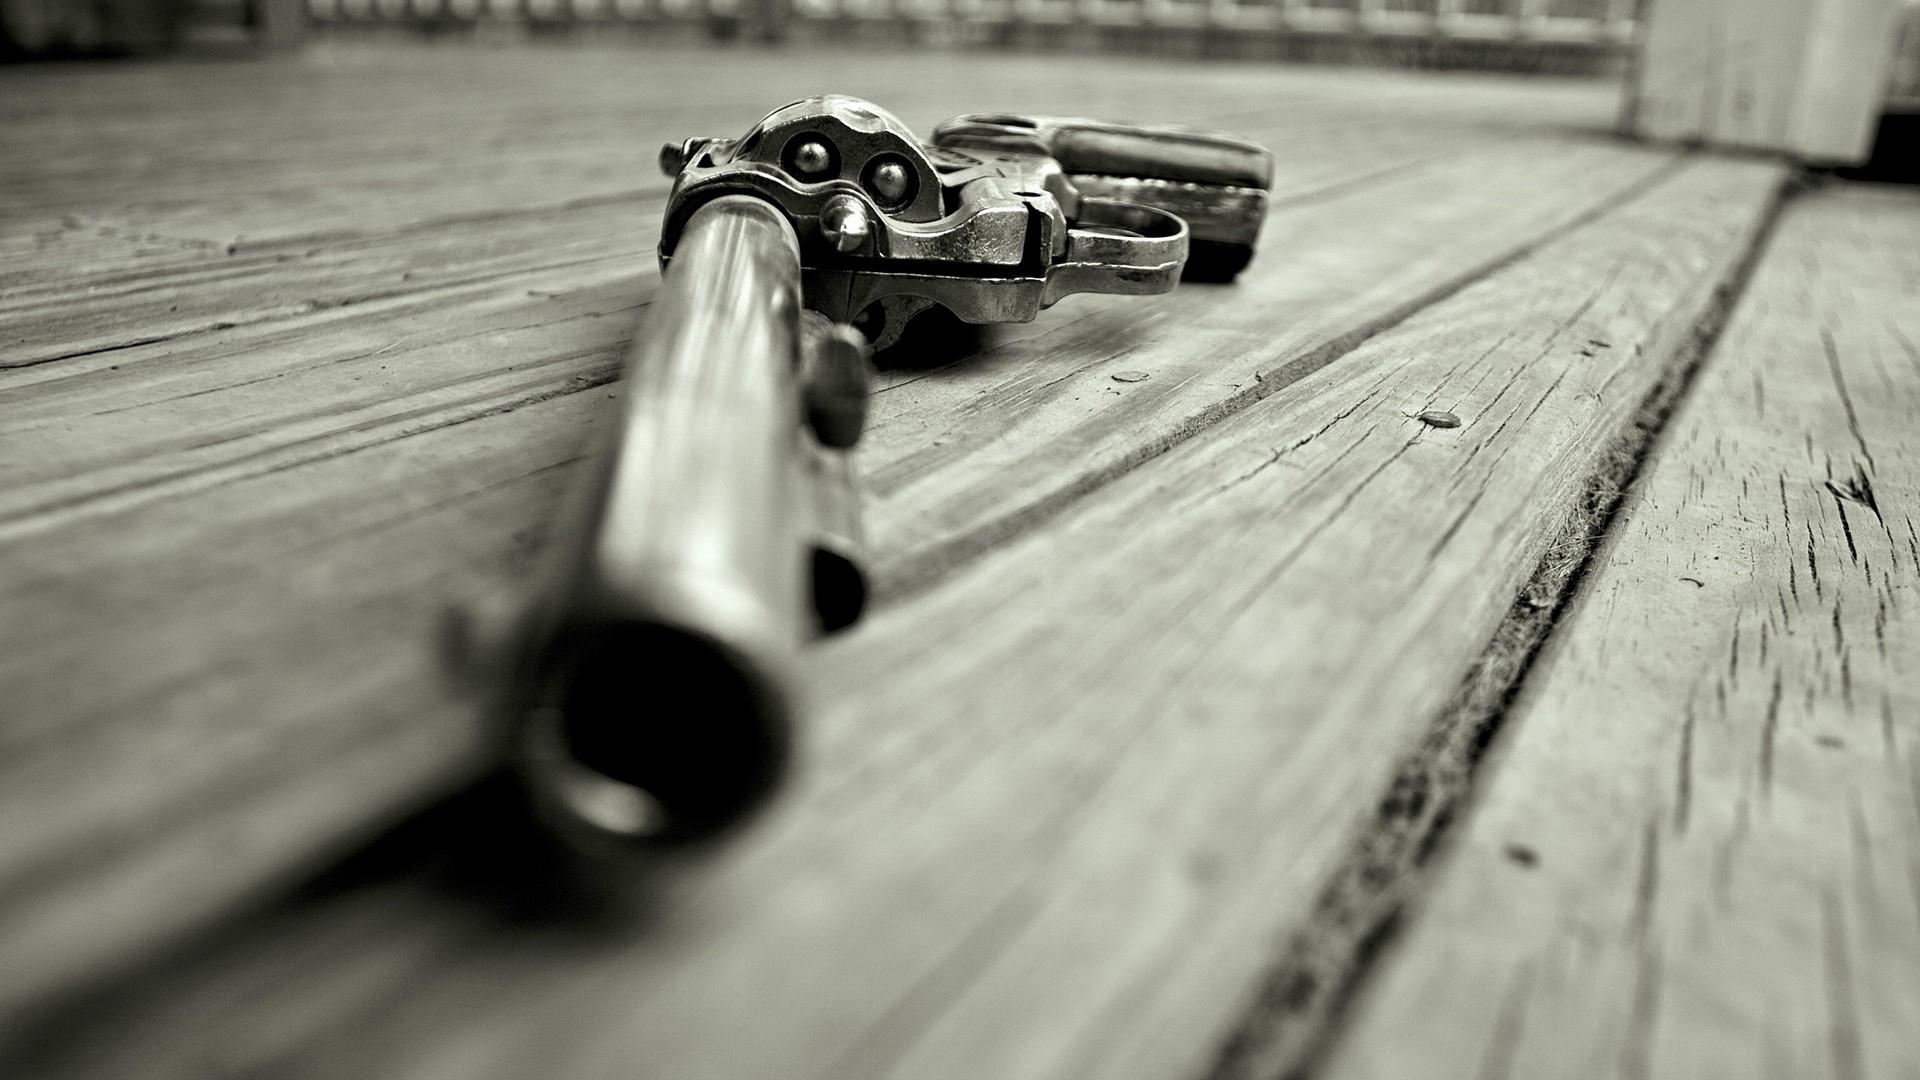 револьвер, барабан, пули